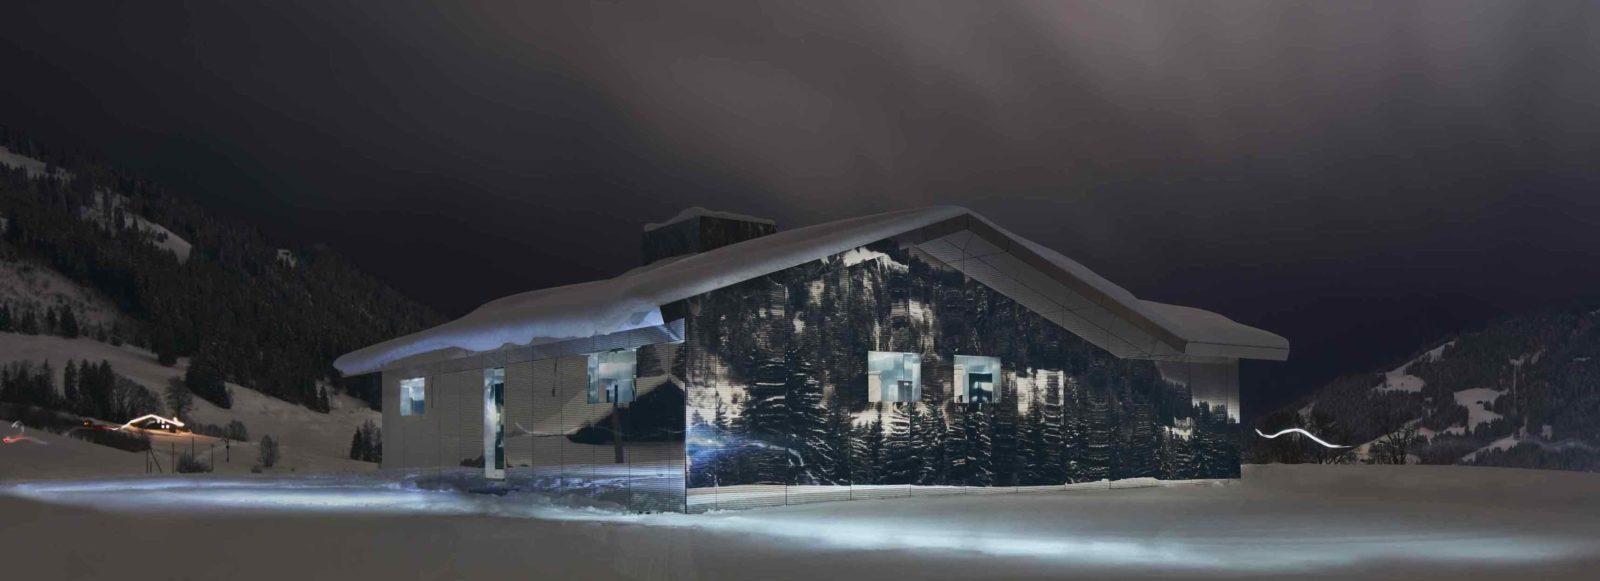 Mirage Gstaad Doug Aitken nuit